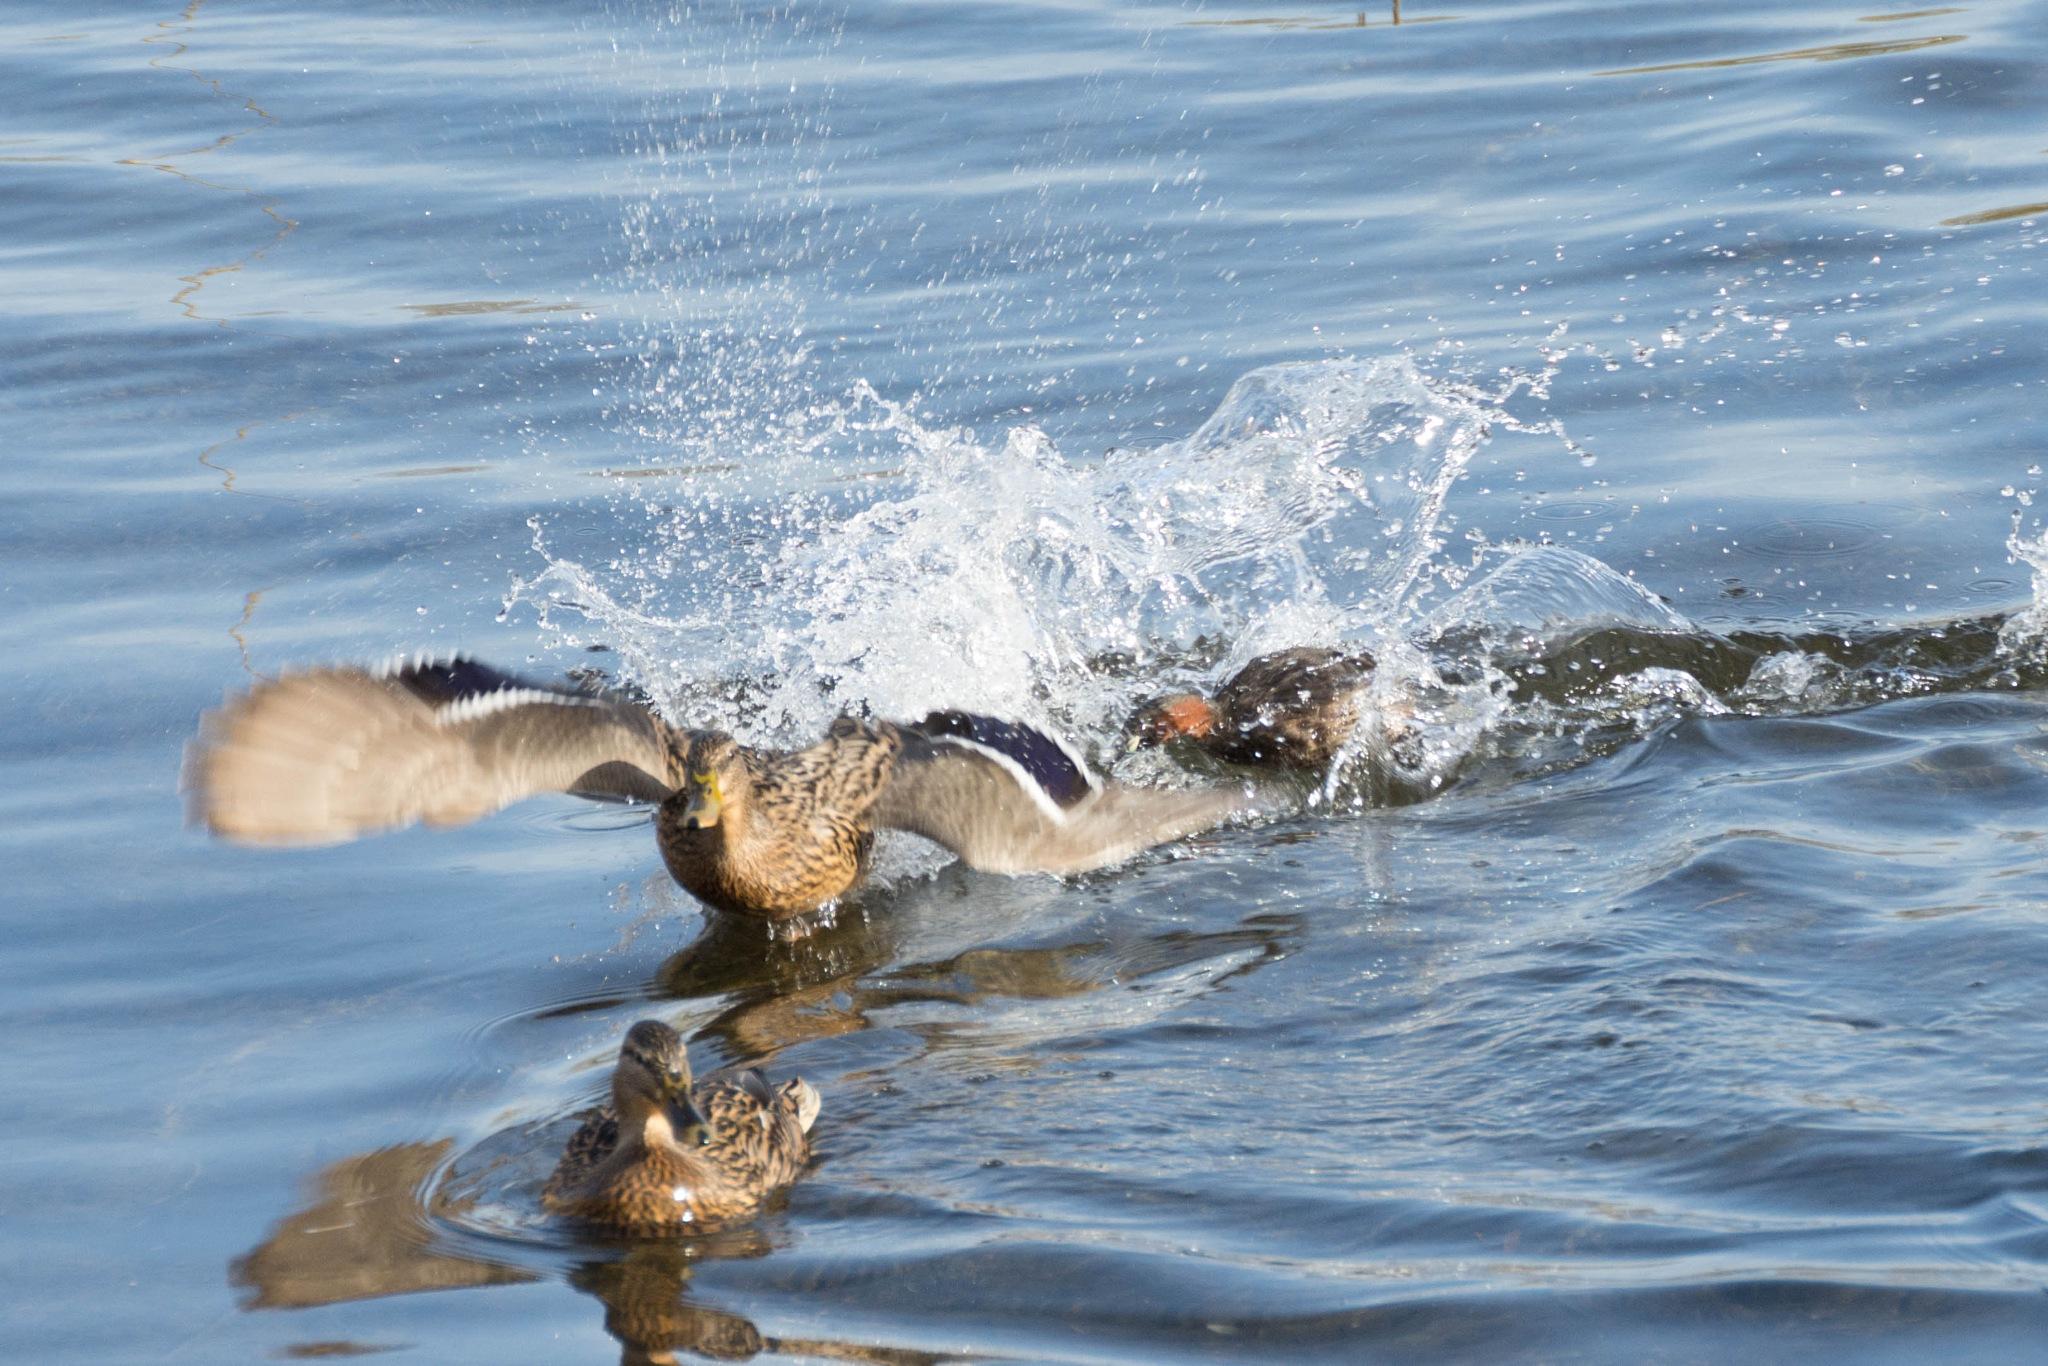 Little Grebe Chasing a Duck by Jockomorrocco